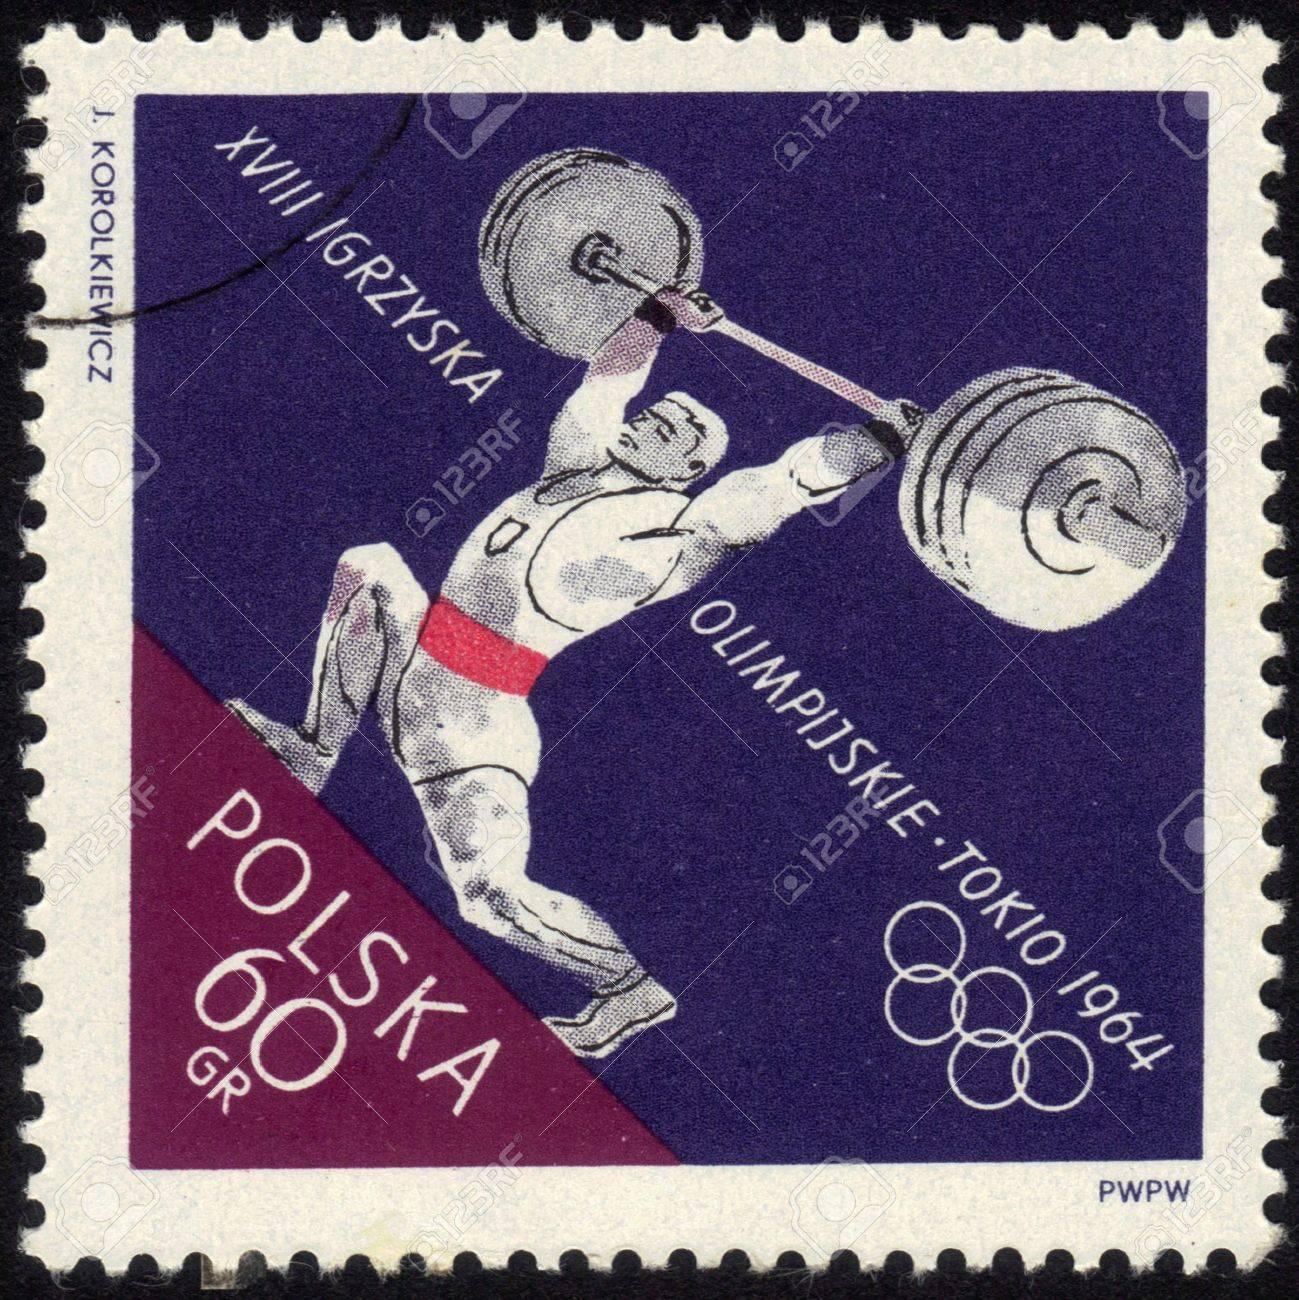 POLAND - CIRCA 1964: a stamp printed by POLAND shows the athlete raises a barbell., Series, circa 1964 Stock Photo - 13601945